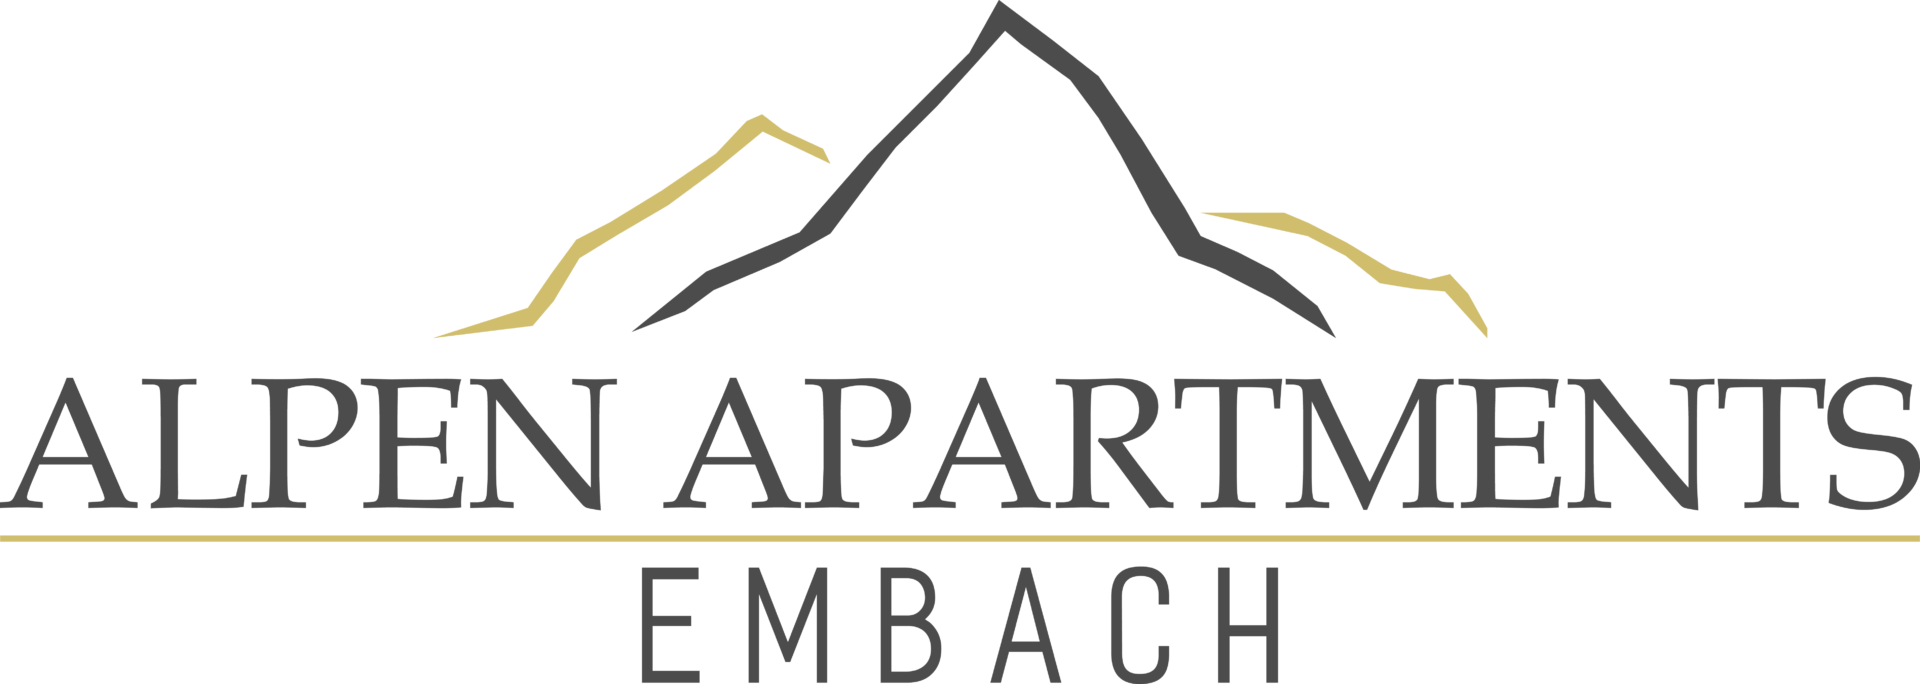 Alpen Apartments Embach